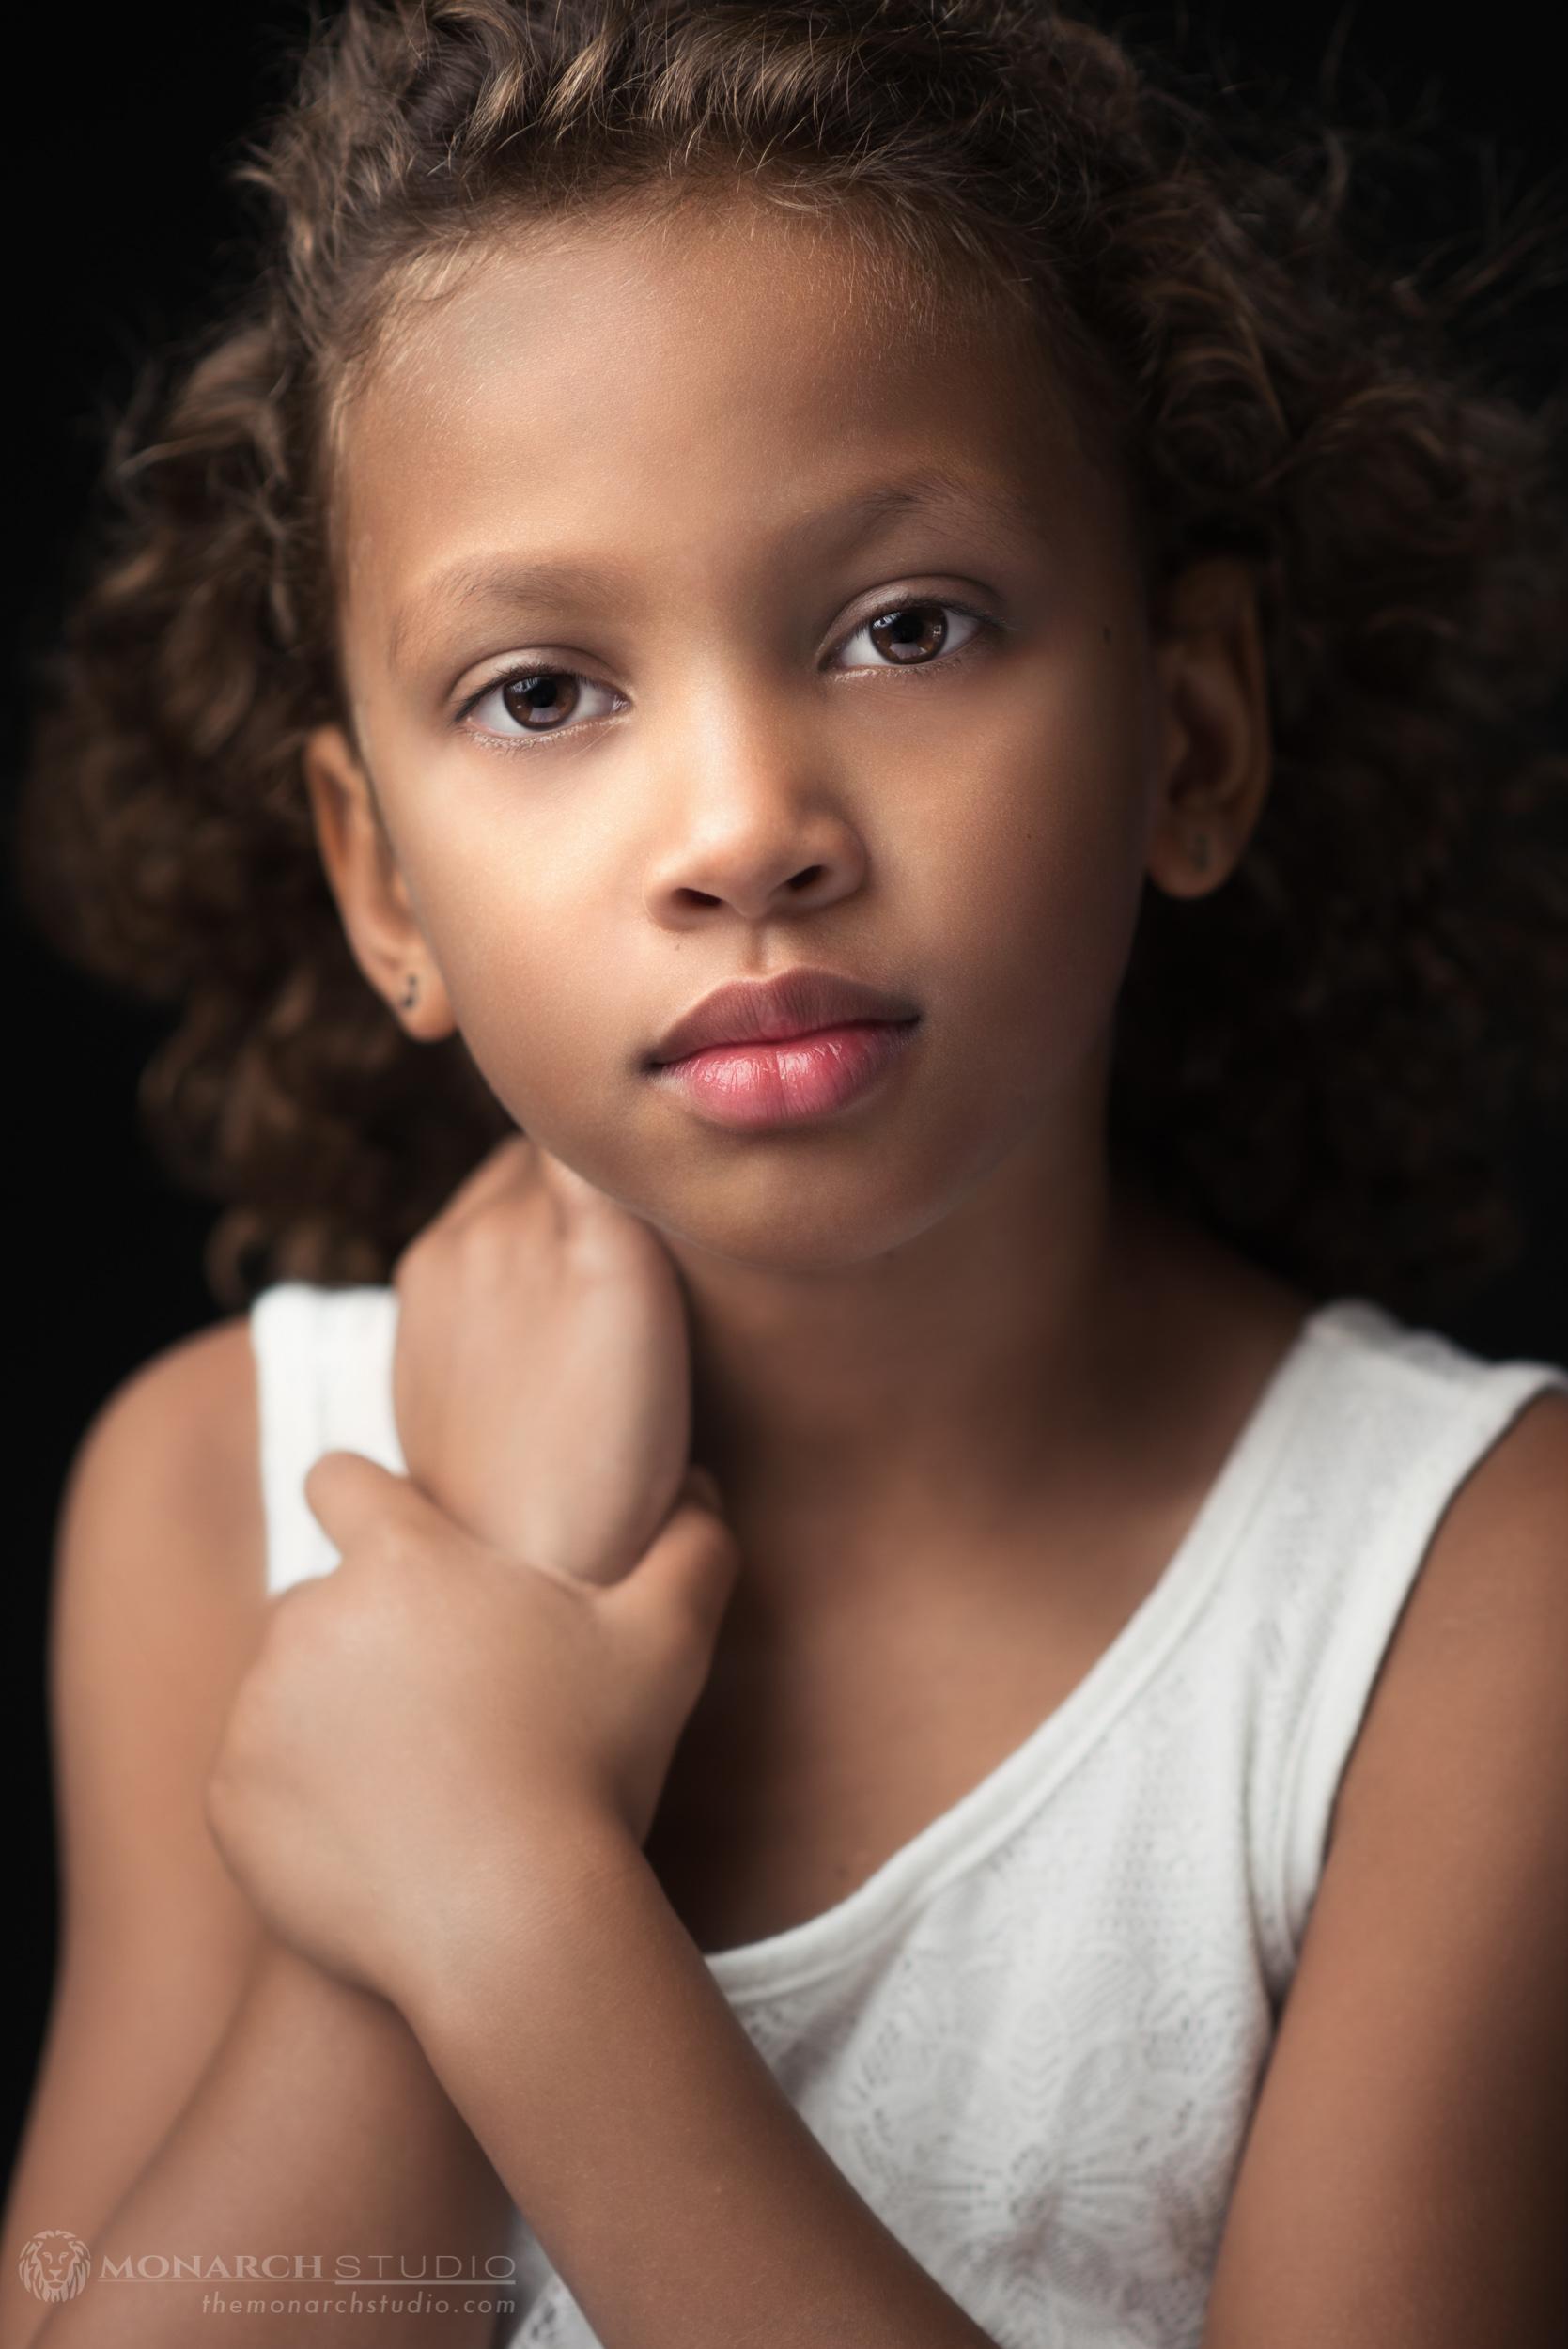 Fine-Art-Childrens-Photographer.jpg